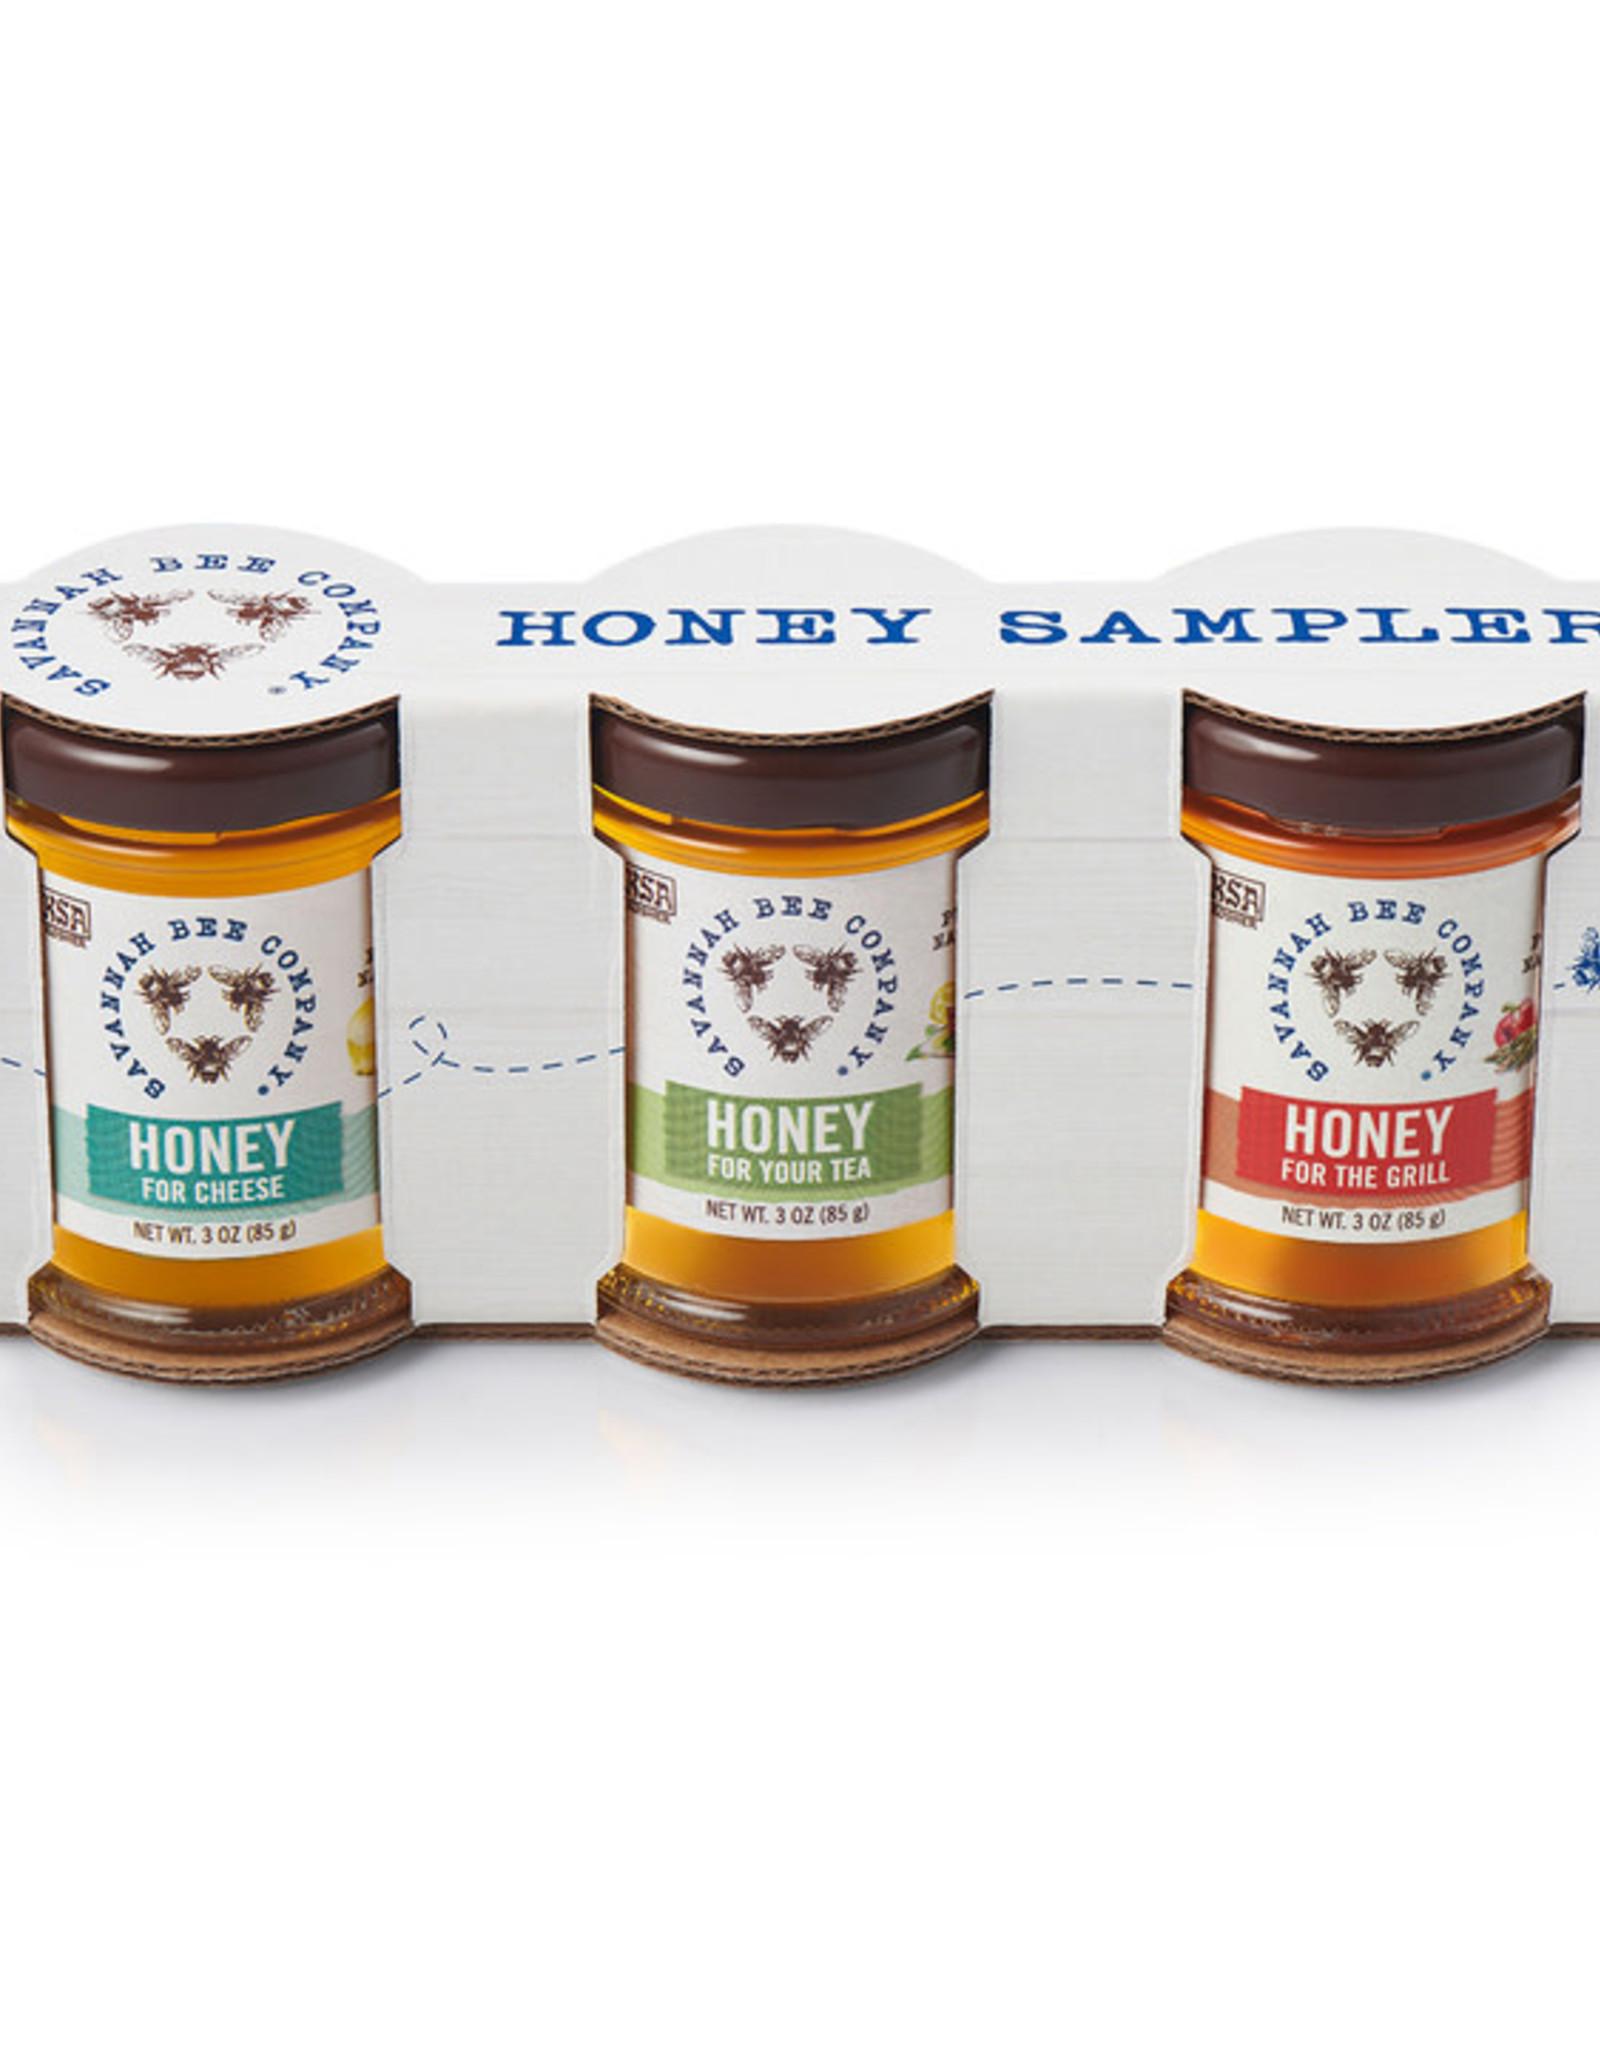 Savannah Bee Company - Honey Sampler